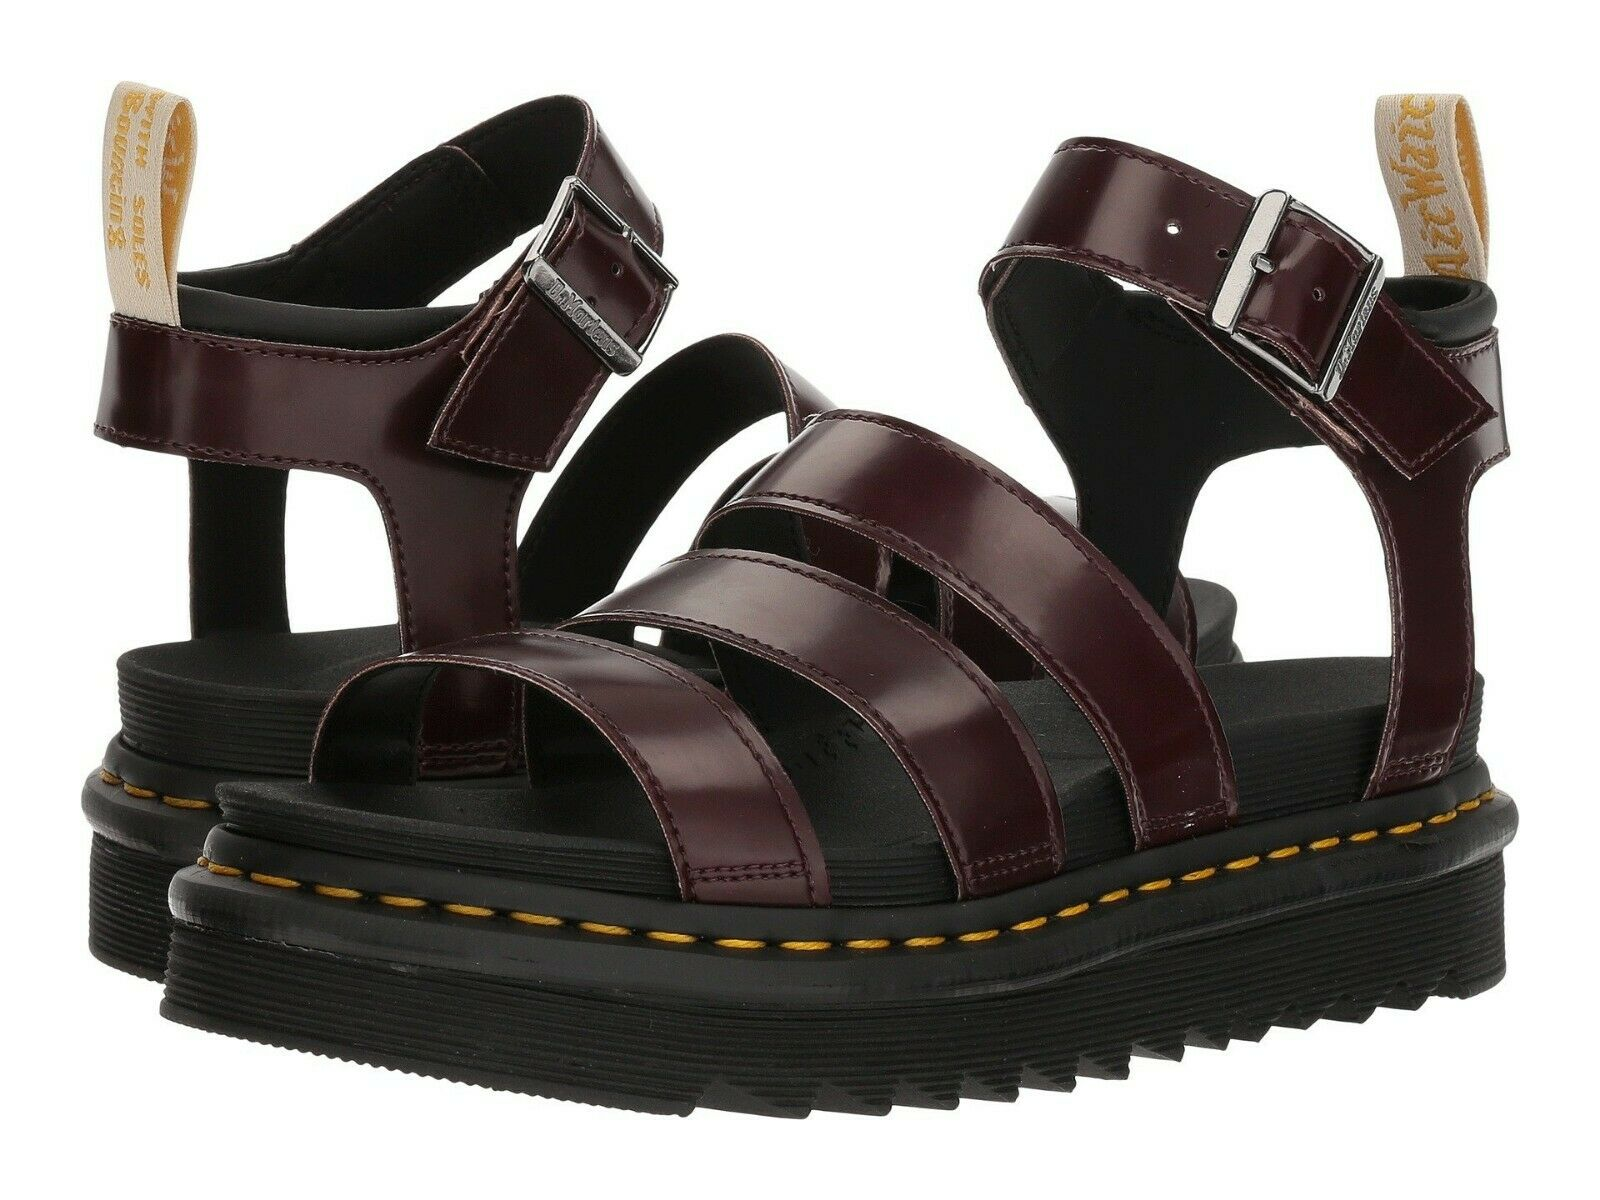 Women's Shoes Dr. Martens BLAIRE VEGAN Casual Sandals 23807600 CHERRY RED